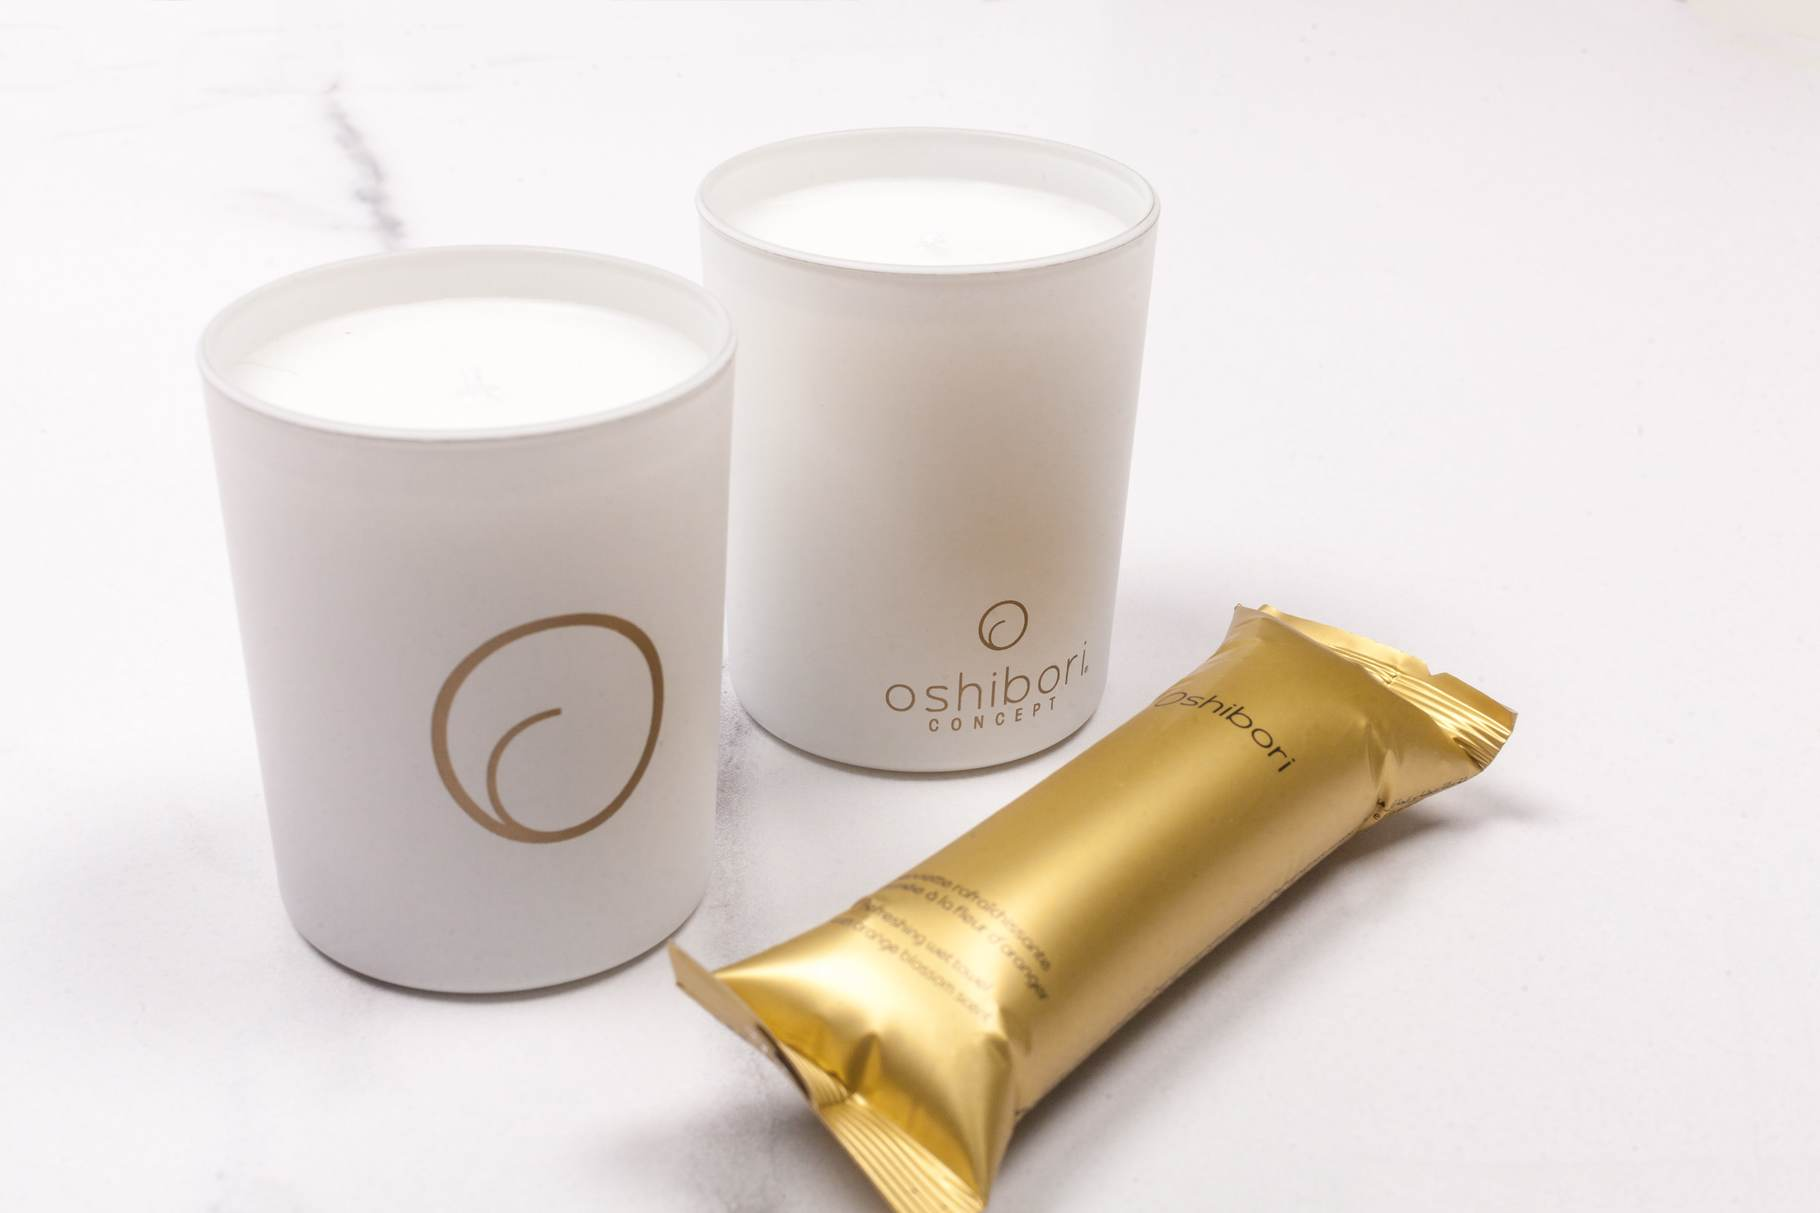 bougies-et-oshibori-gold-header_5c584182